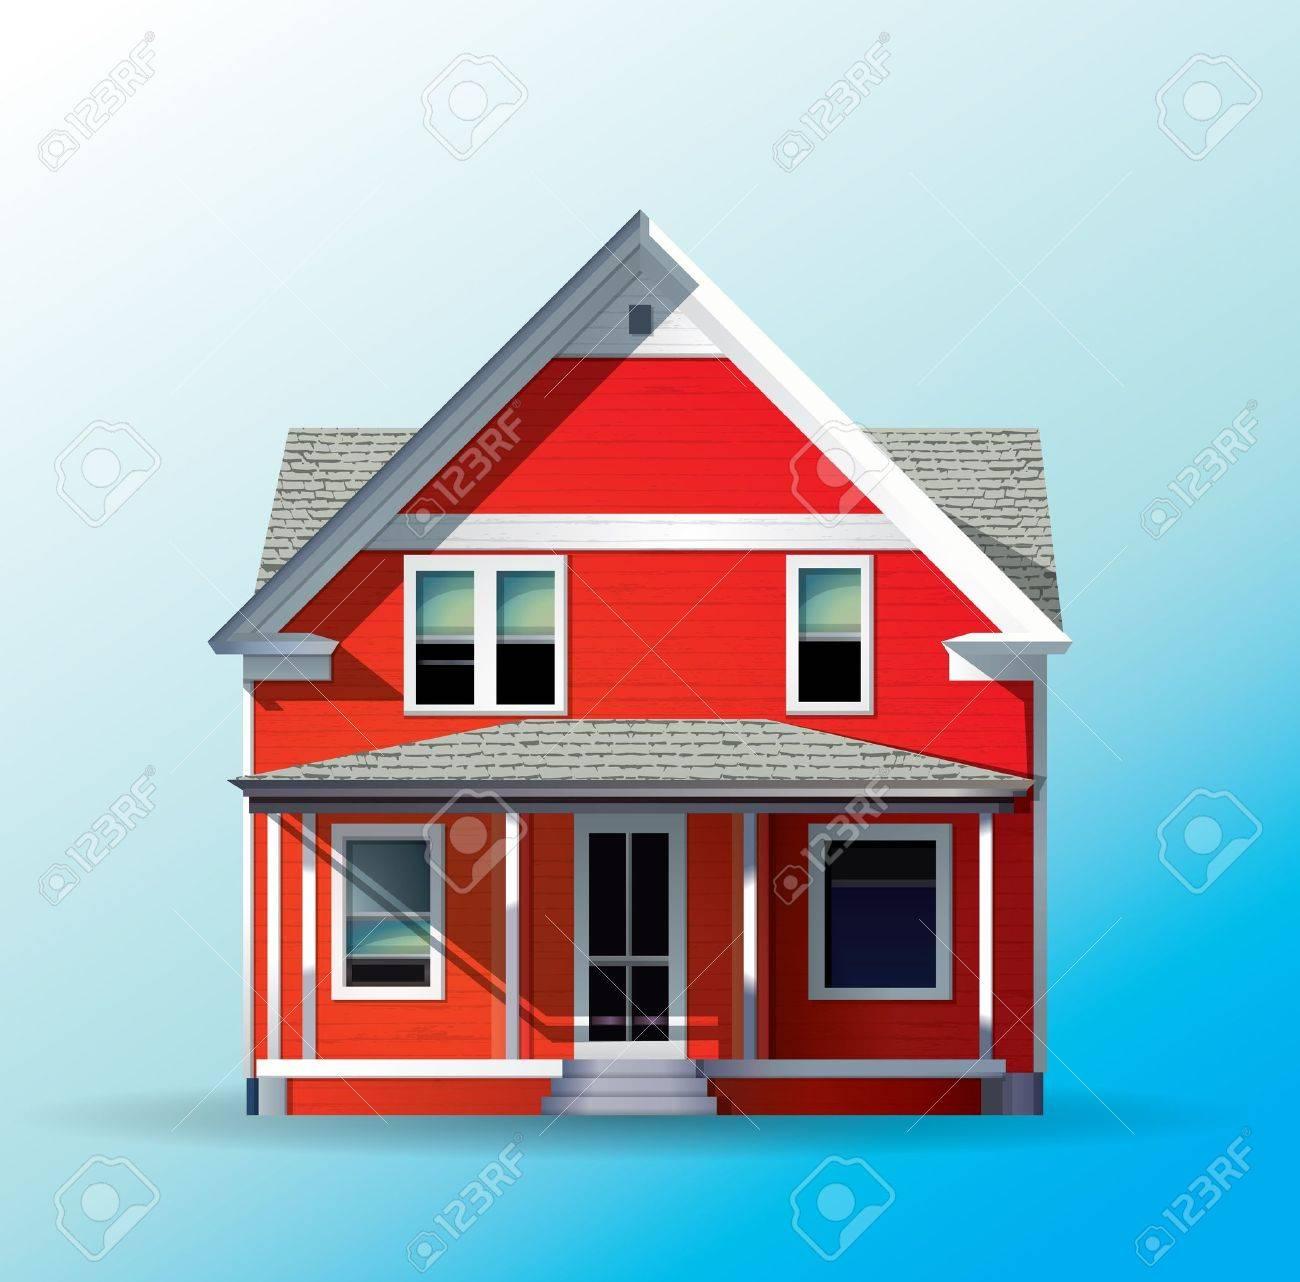 Family House Stock Vector - 12158884